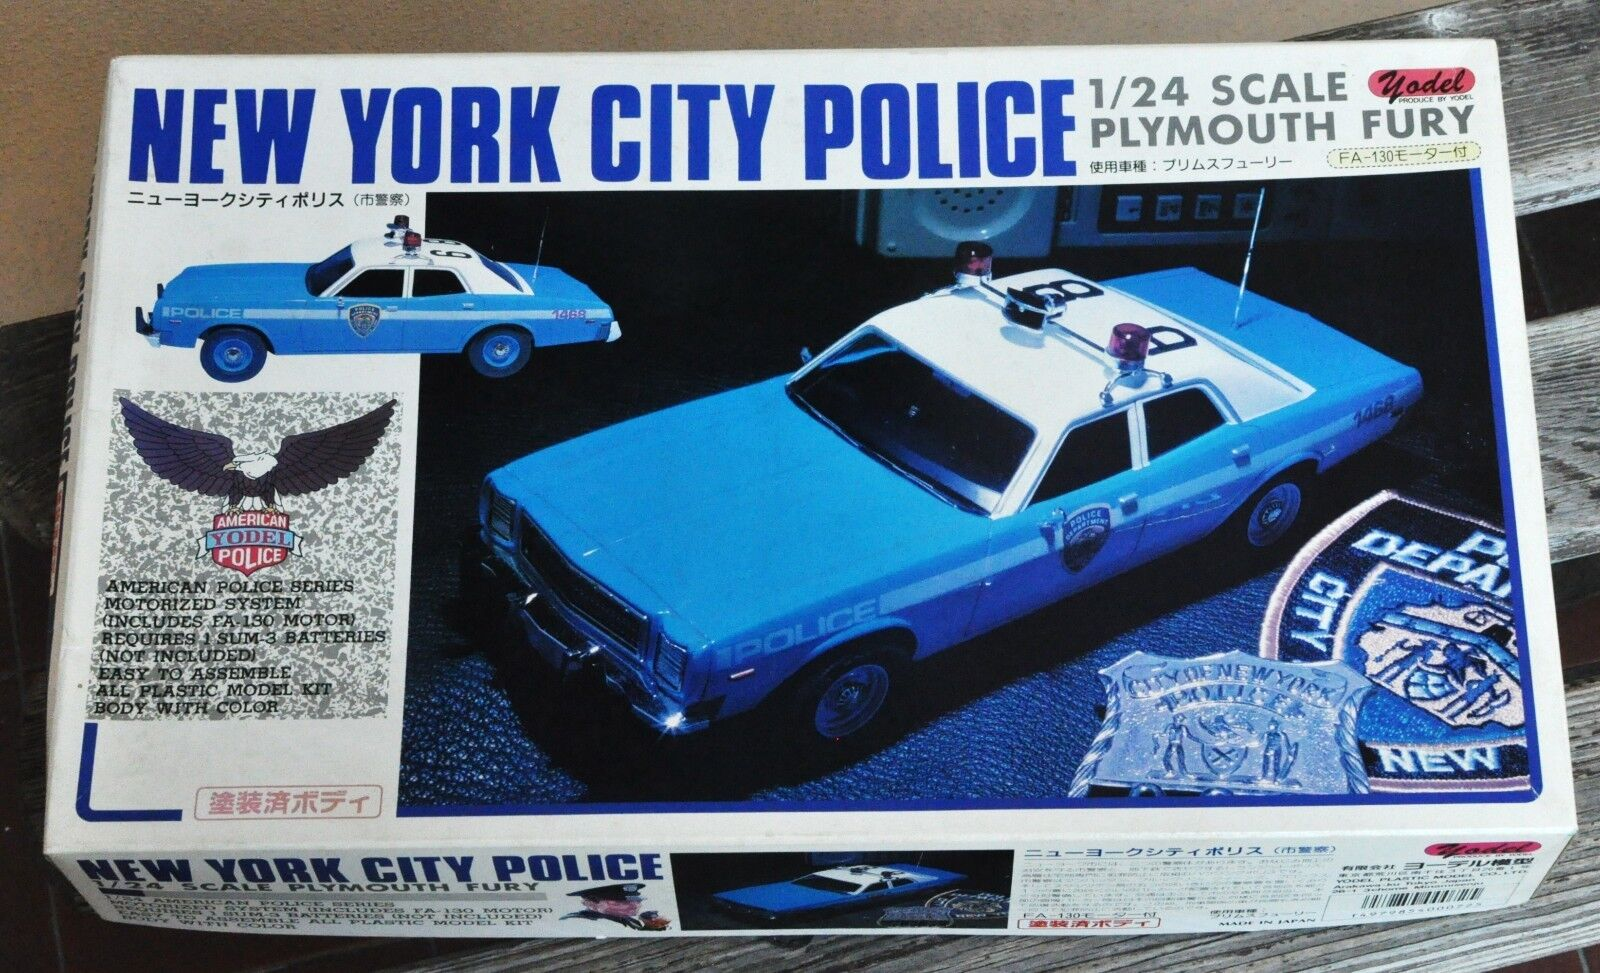 YODEL MODEL 1/24 KIT PLYMOUTH FURY POLICE CAR VINTAGE RARE